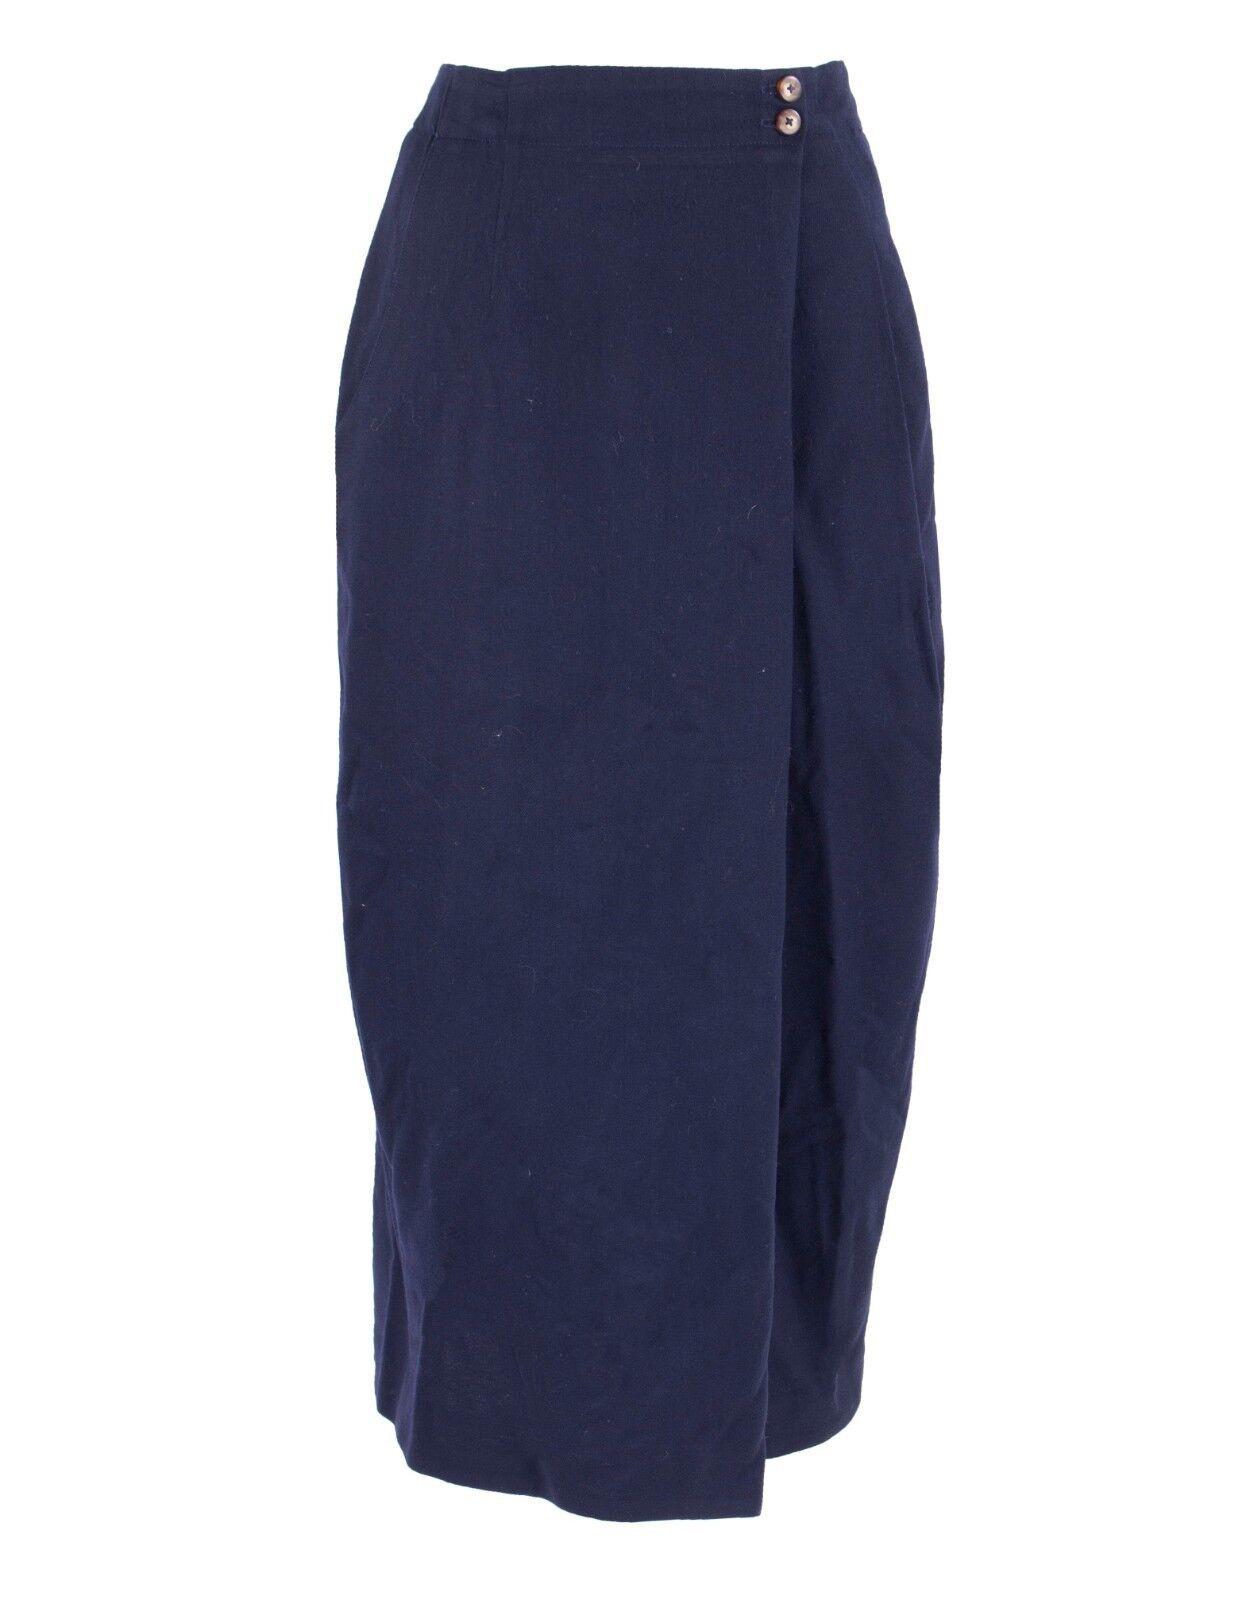 Dior Navy Skirt Size 12 Vintage